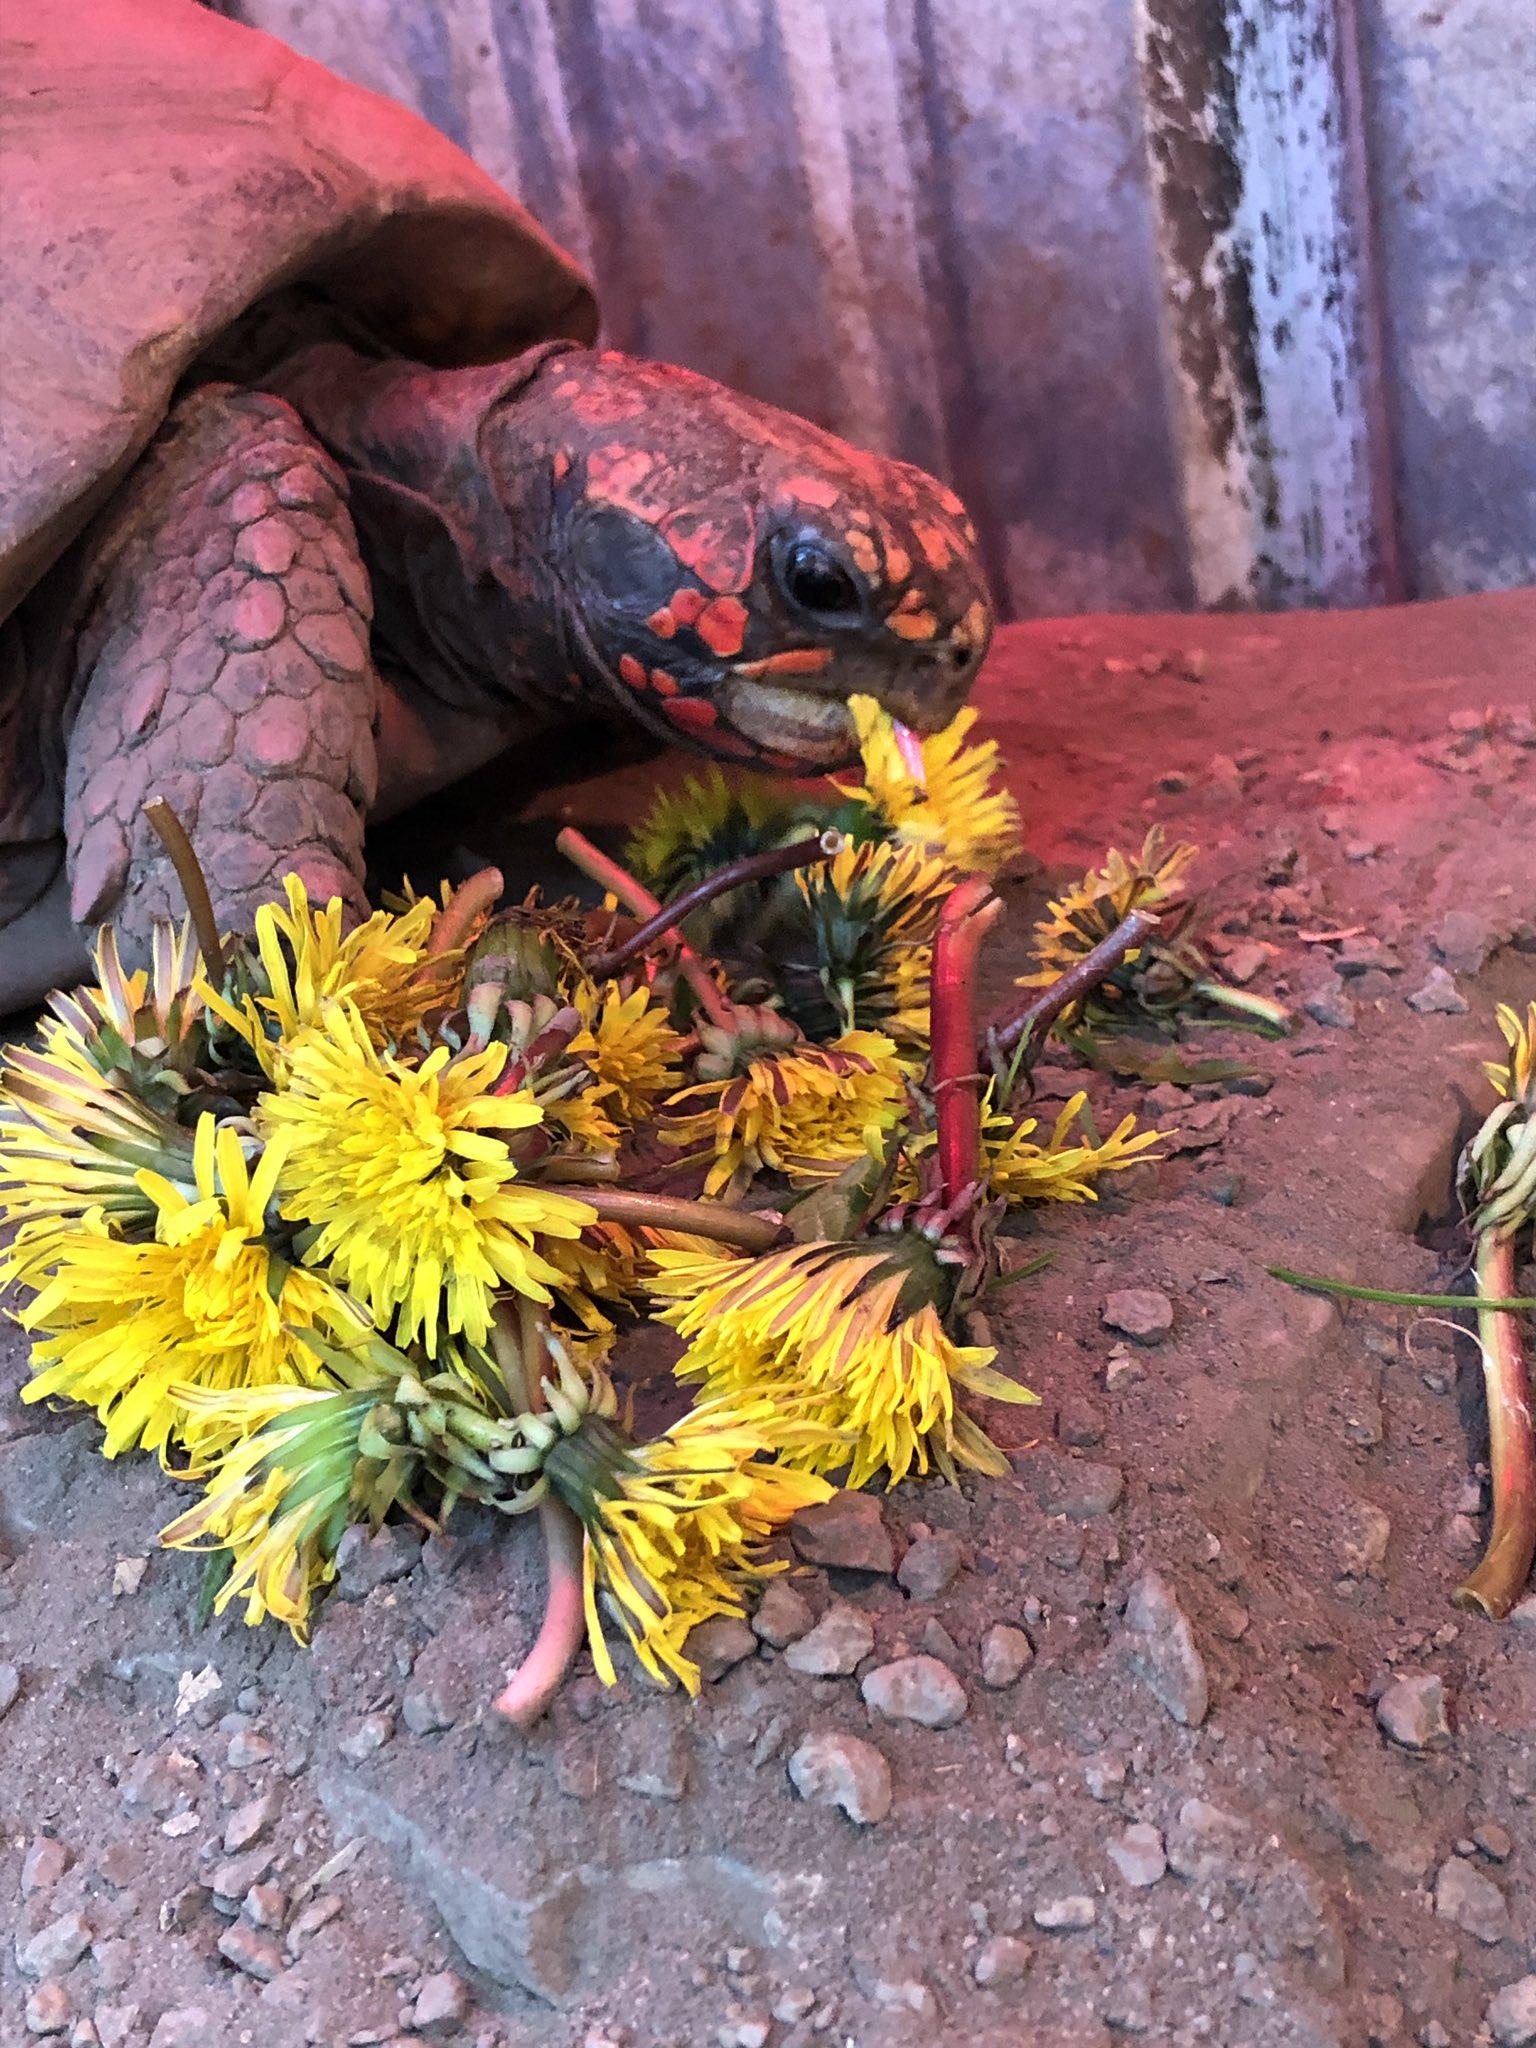 Buffalo Zoo Wants Stolen Red-Footed Tortoise Returned